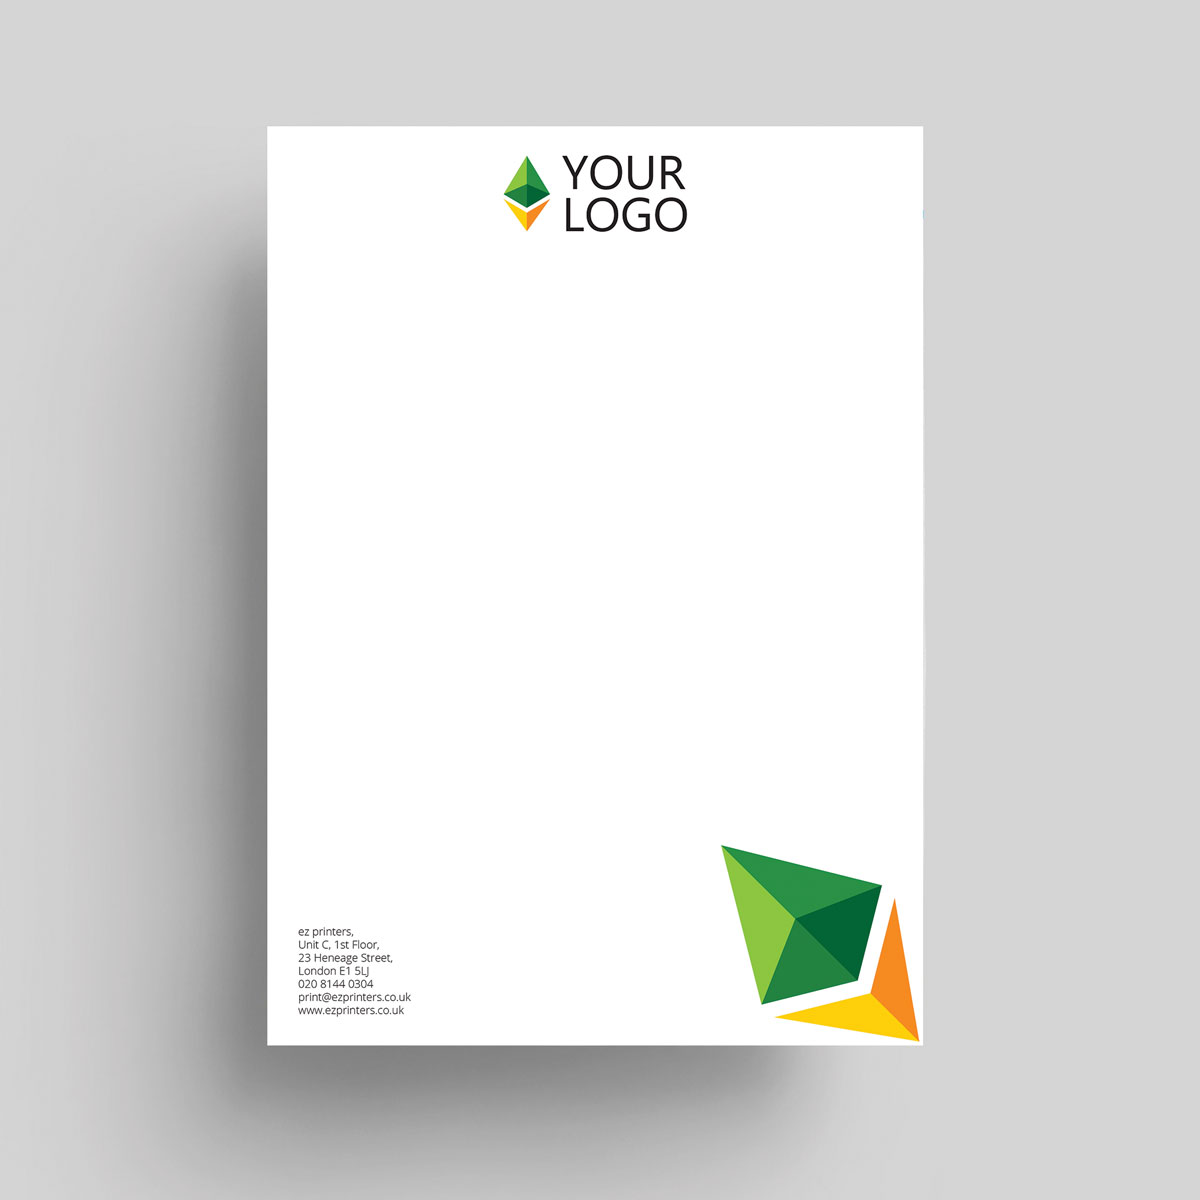 trade price letterhead printer company ec1 london me